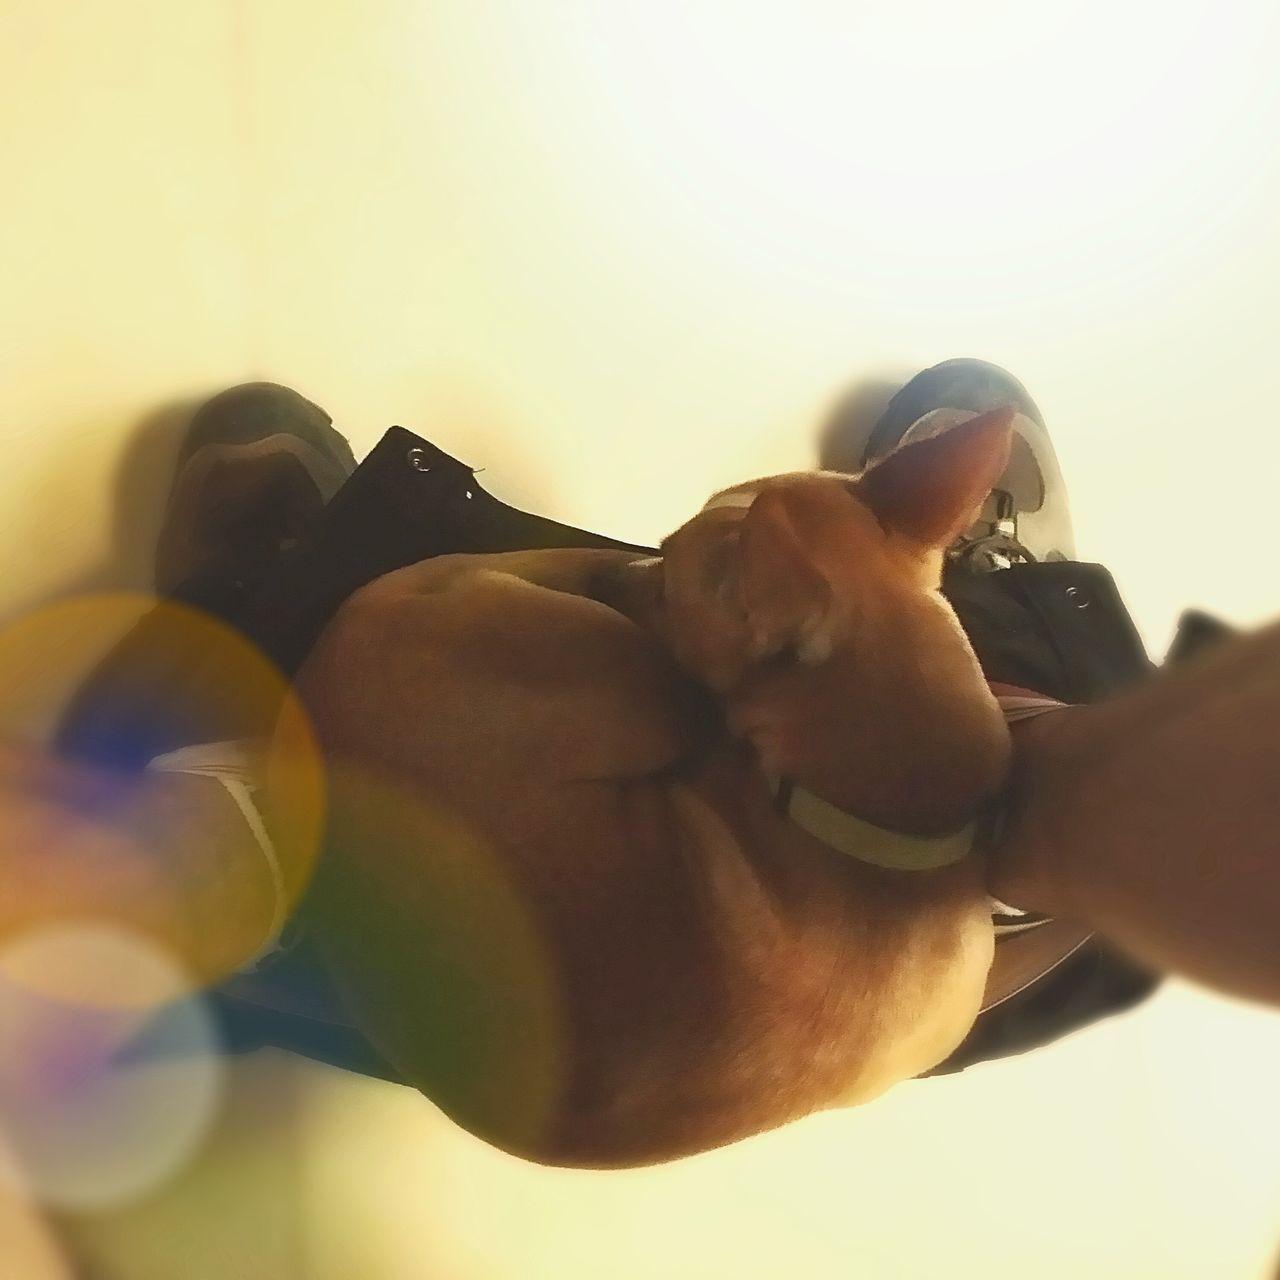 Art Is Portable With Caseable Somos Felices Streamzoofamily Dogs EyeEm Best Shots Mi Pollo Y Yo España